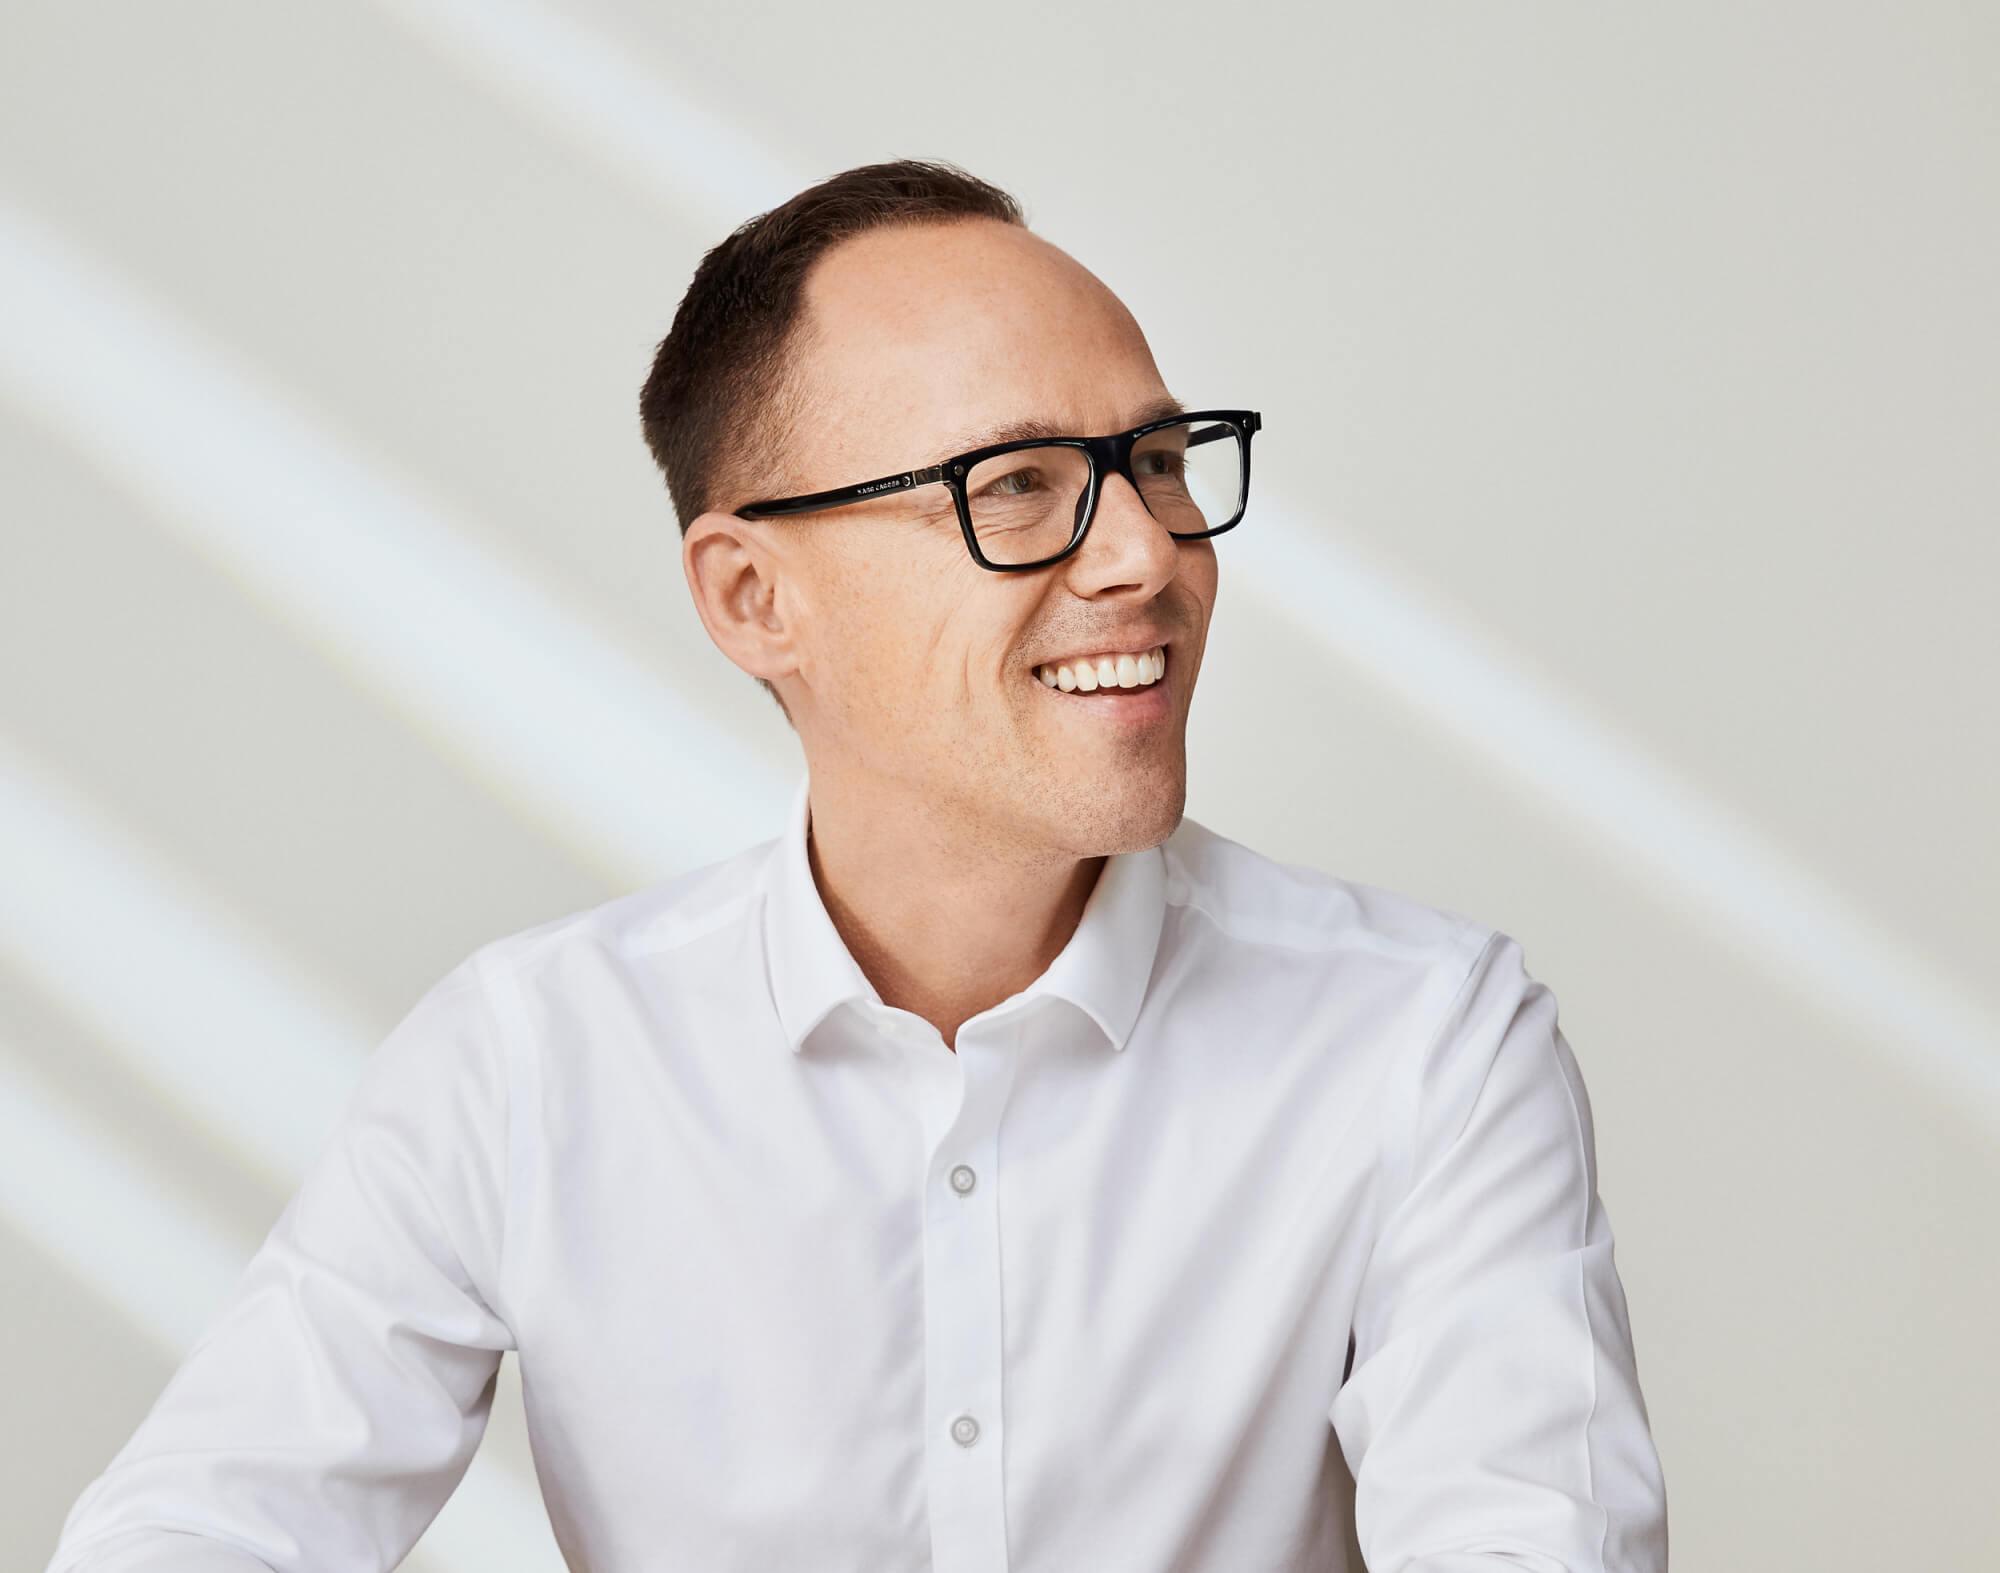 Lars André Gjerdrum